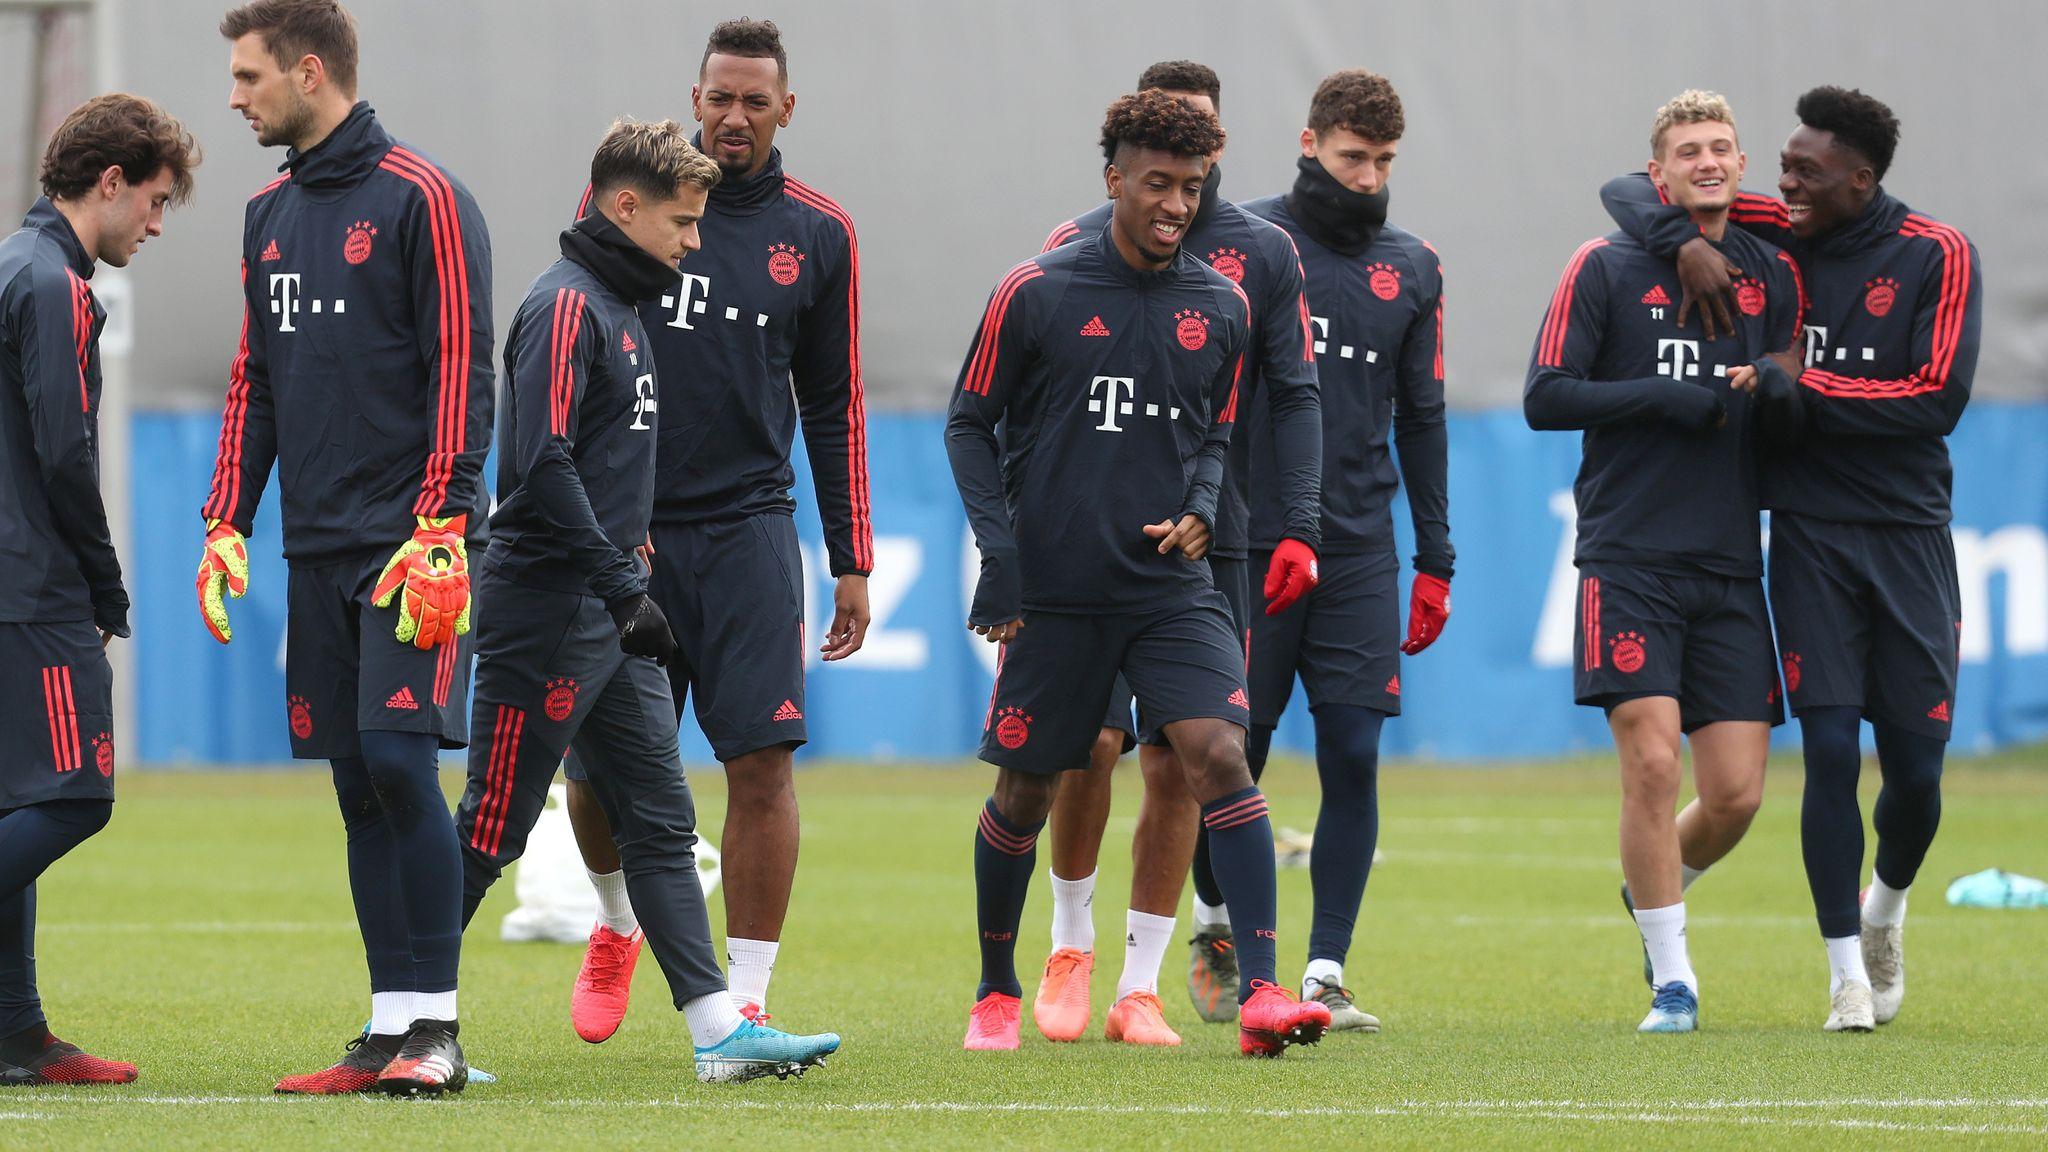 Bayern Munich Return To Training In Small Groups Football News Sky Sports